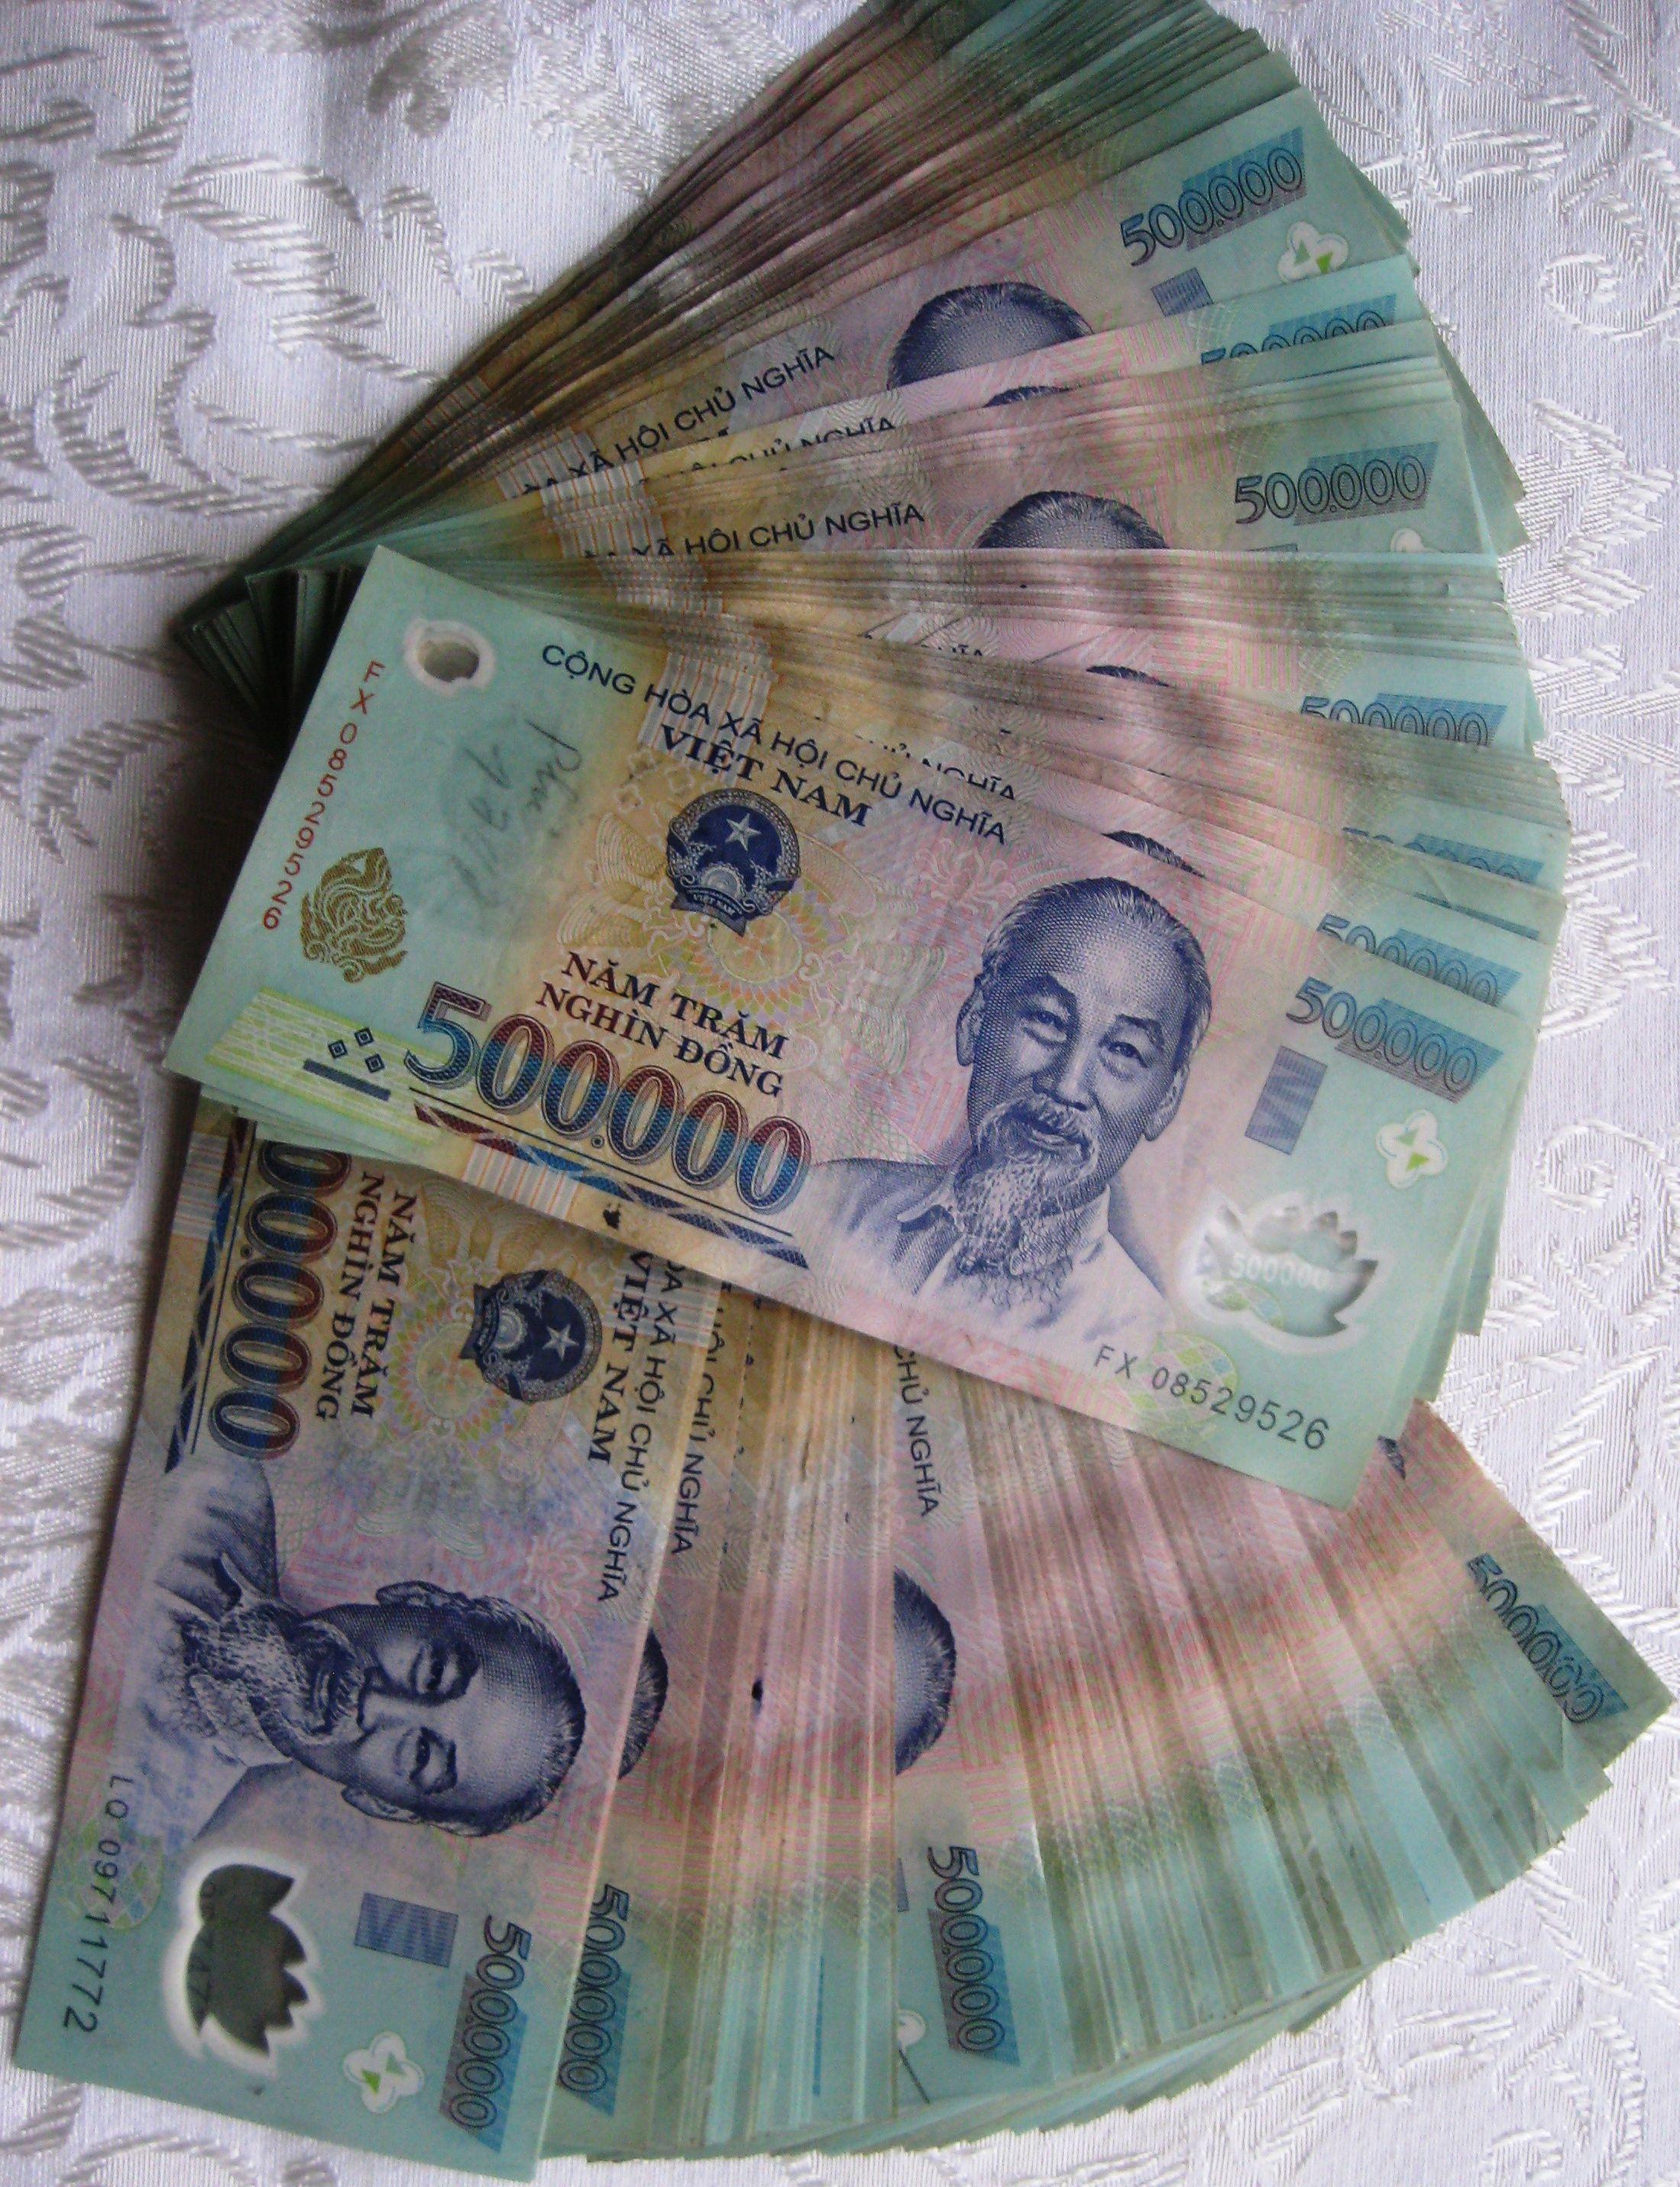 Vietnam Dong Banknotes 500 000 Denomination Circulated Notes Iraqidinarhere Com